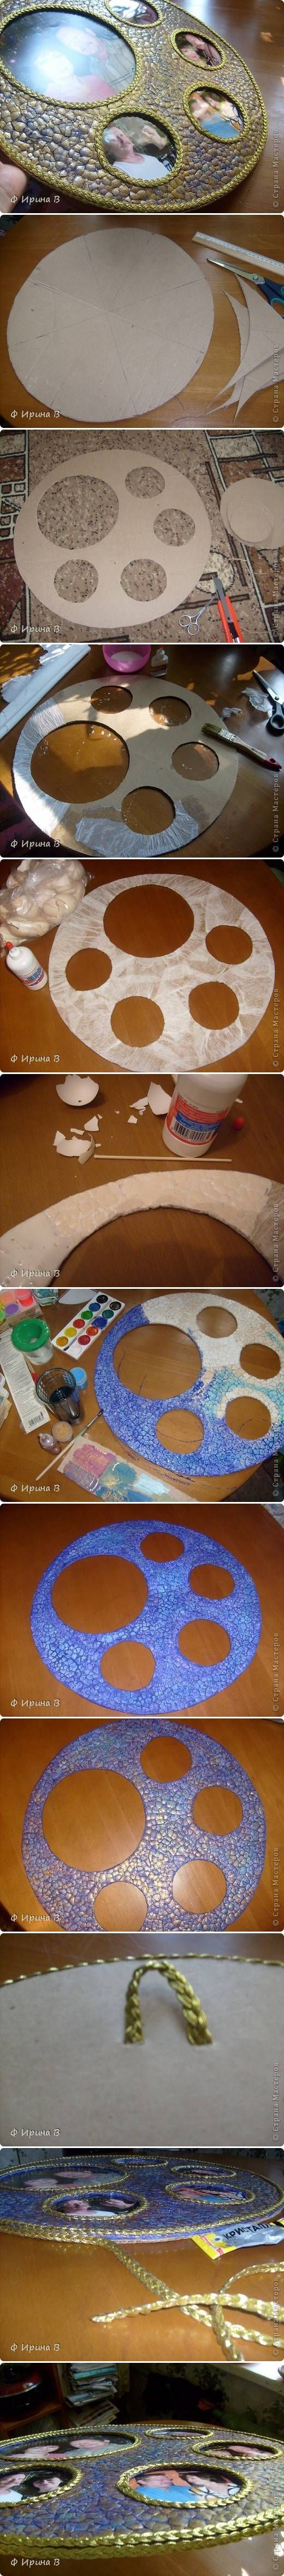 DIY Eggshell Panorama Frame